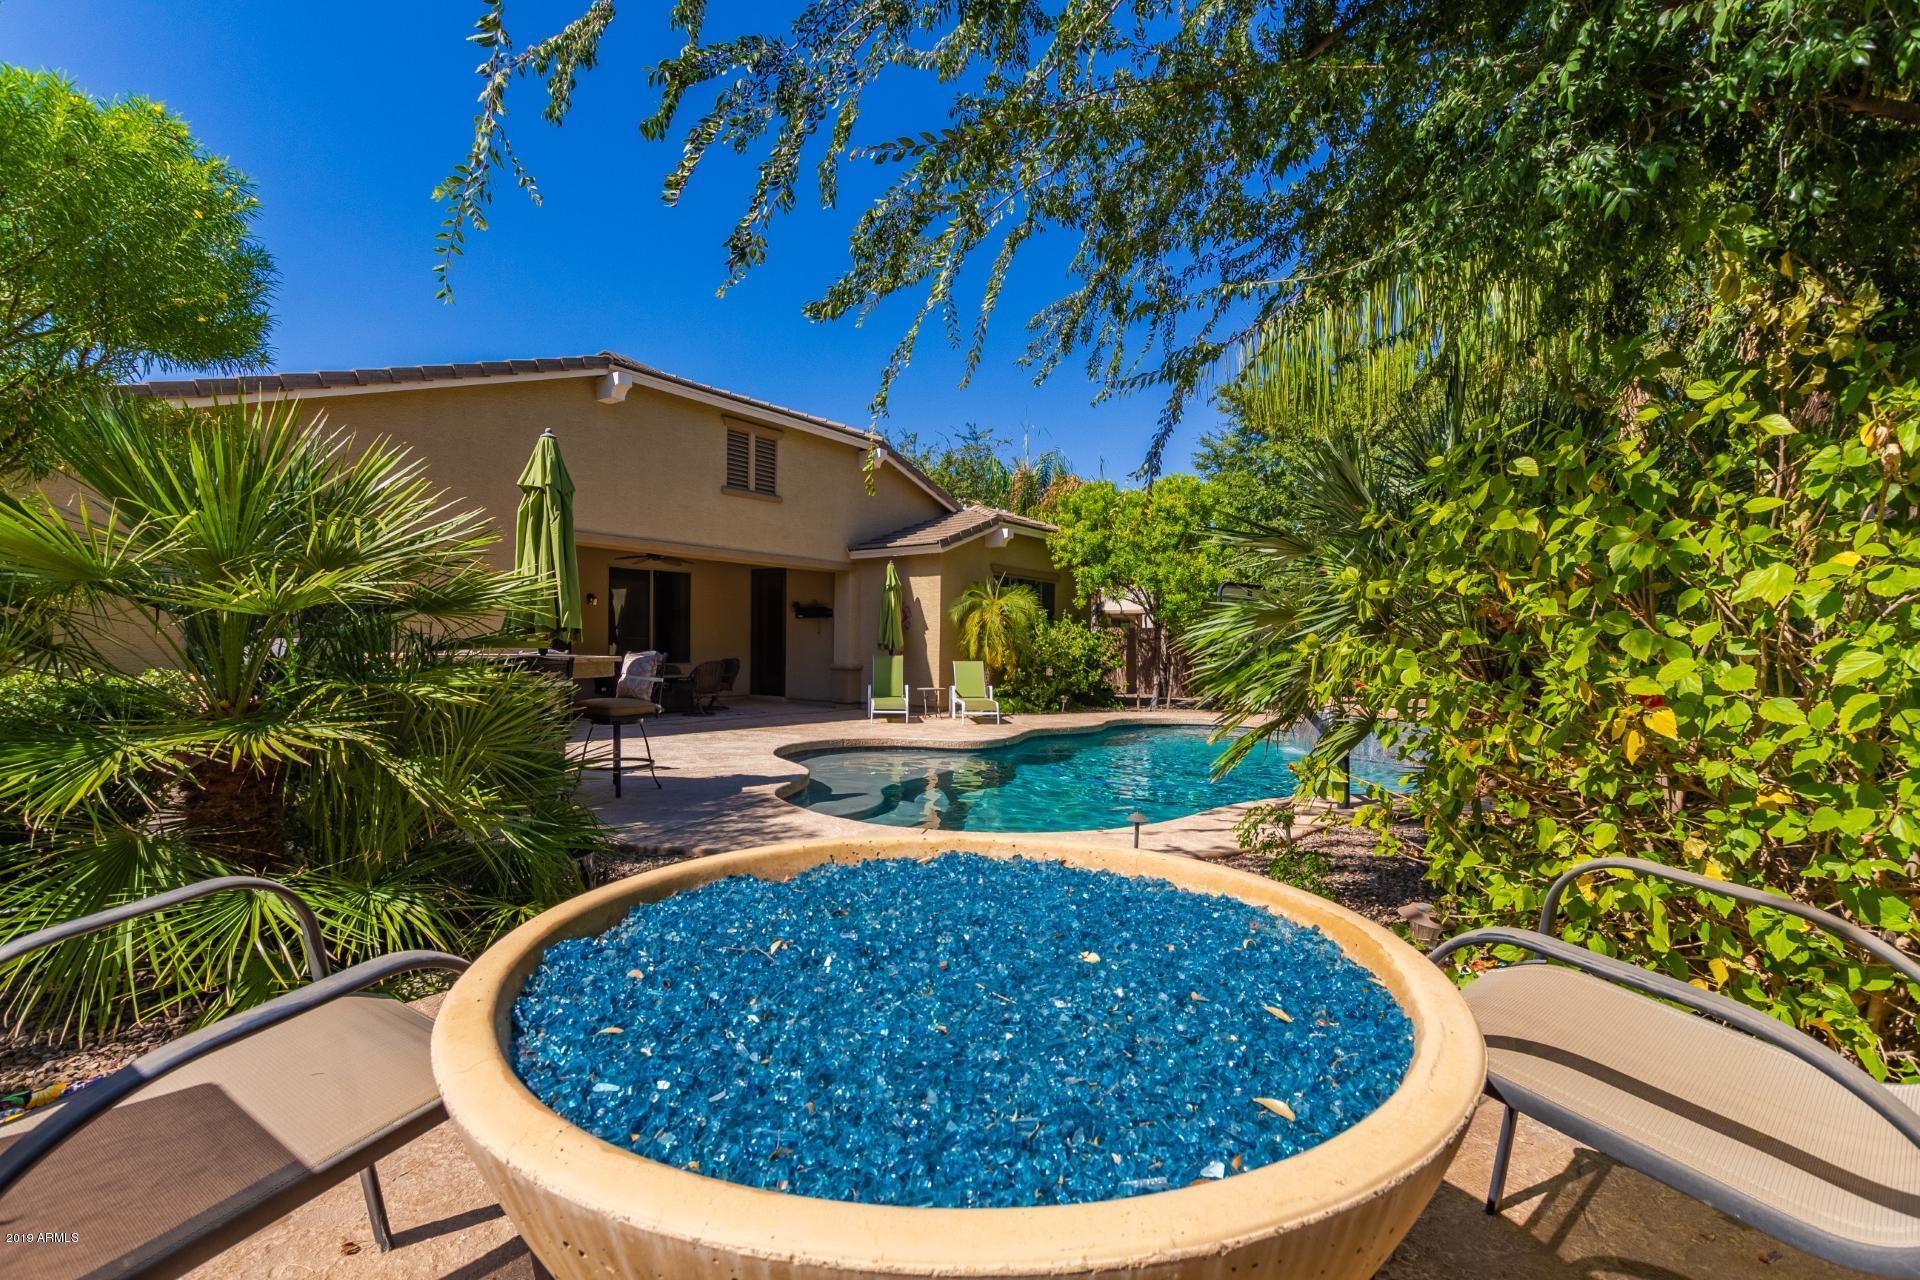 MLS 5969233 76 W LYNX Way, Chandler, AZ 85248 Chandler AZ Fulton Ranch